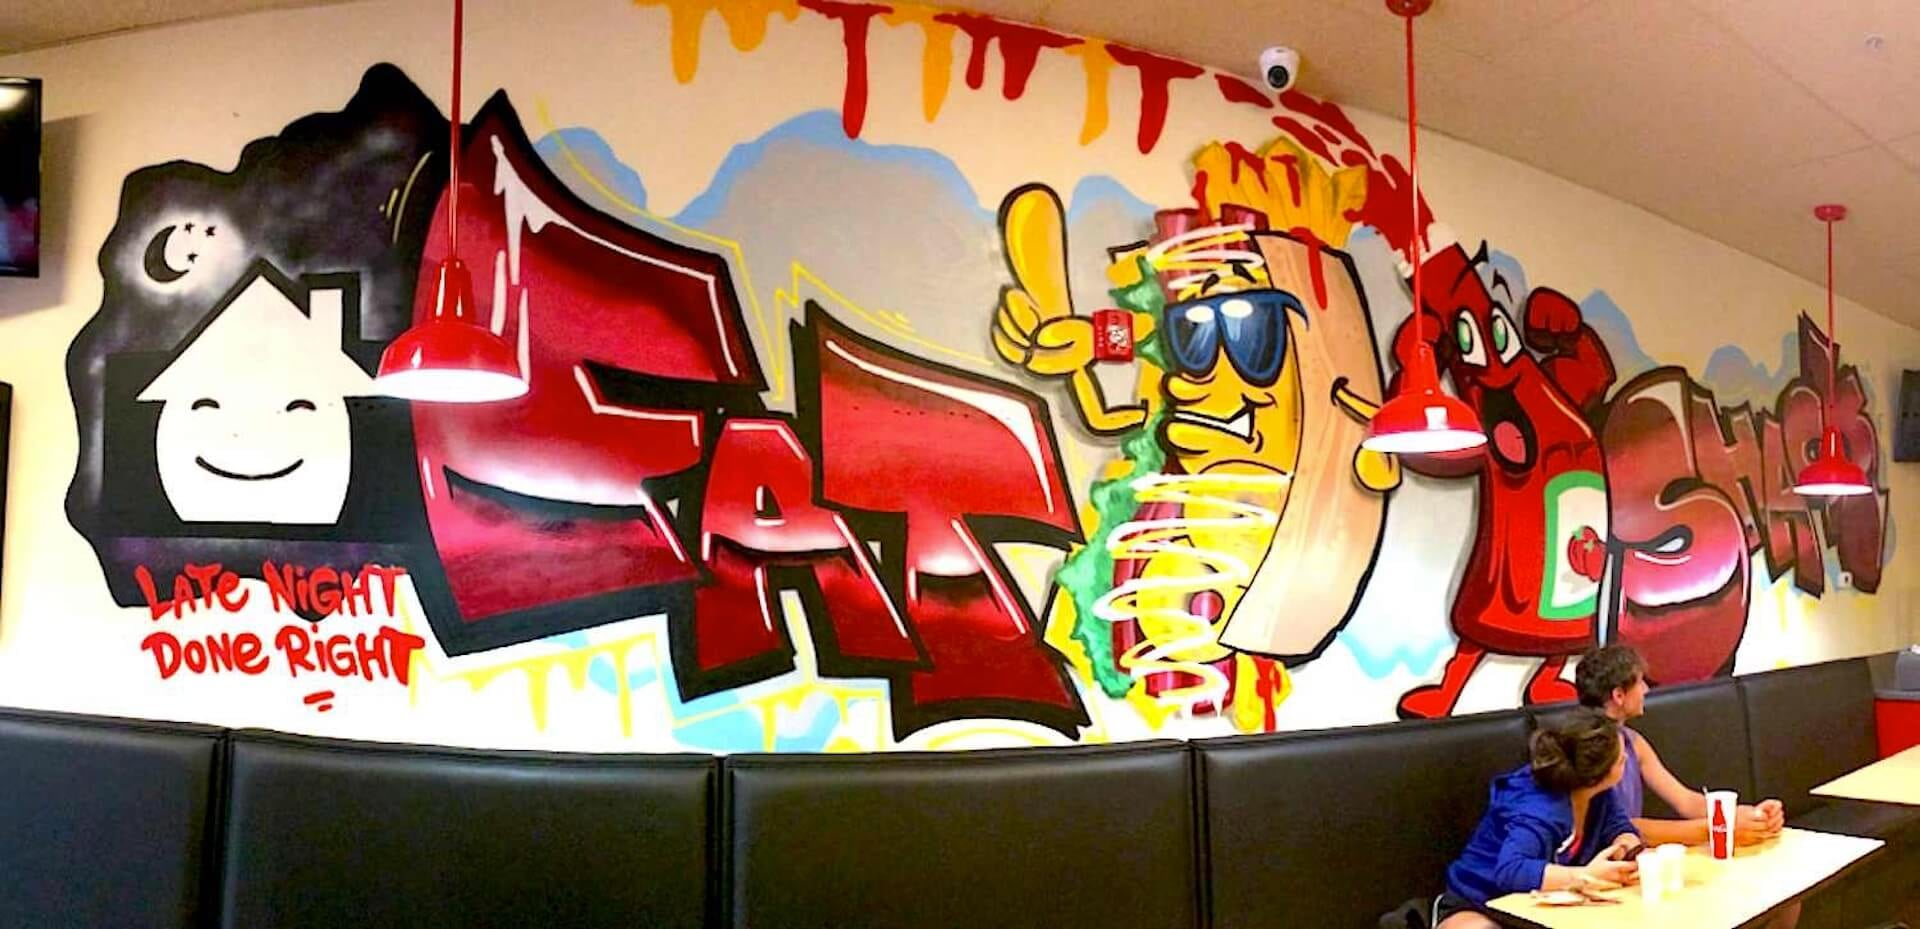 Commissioned Restaurant Graffiti Mural for Fat Shack | Boulder USA, 2014